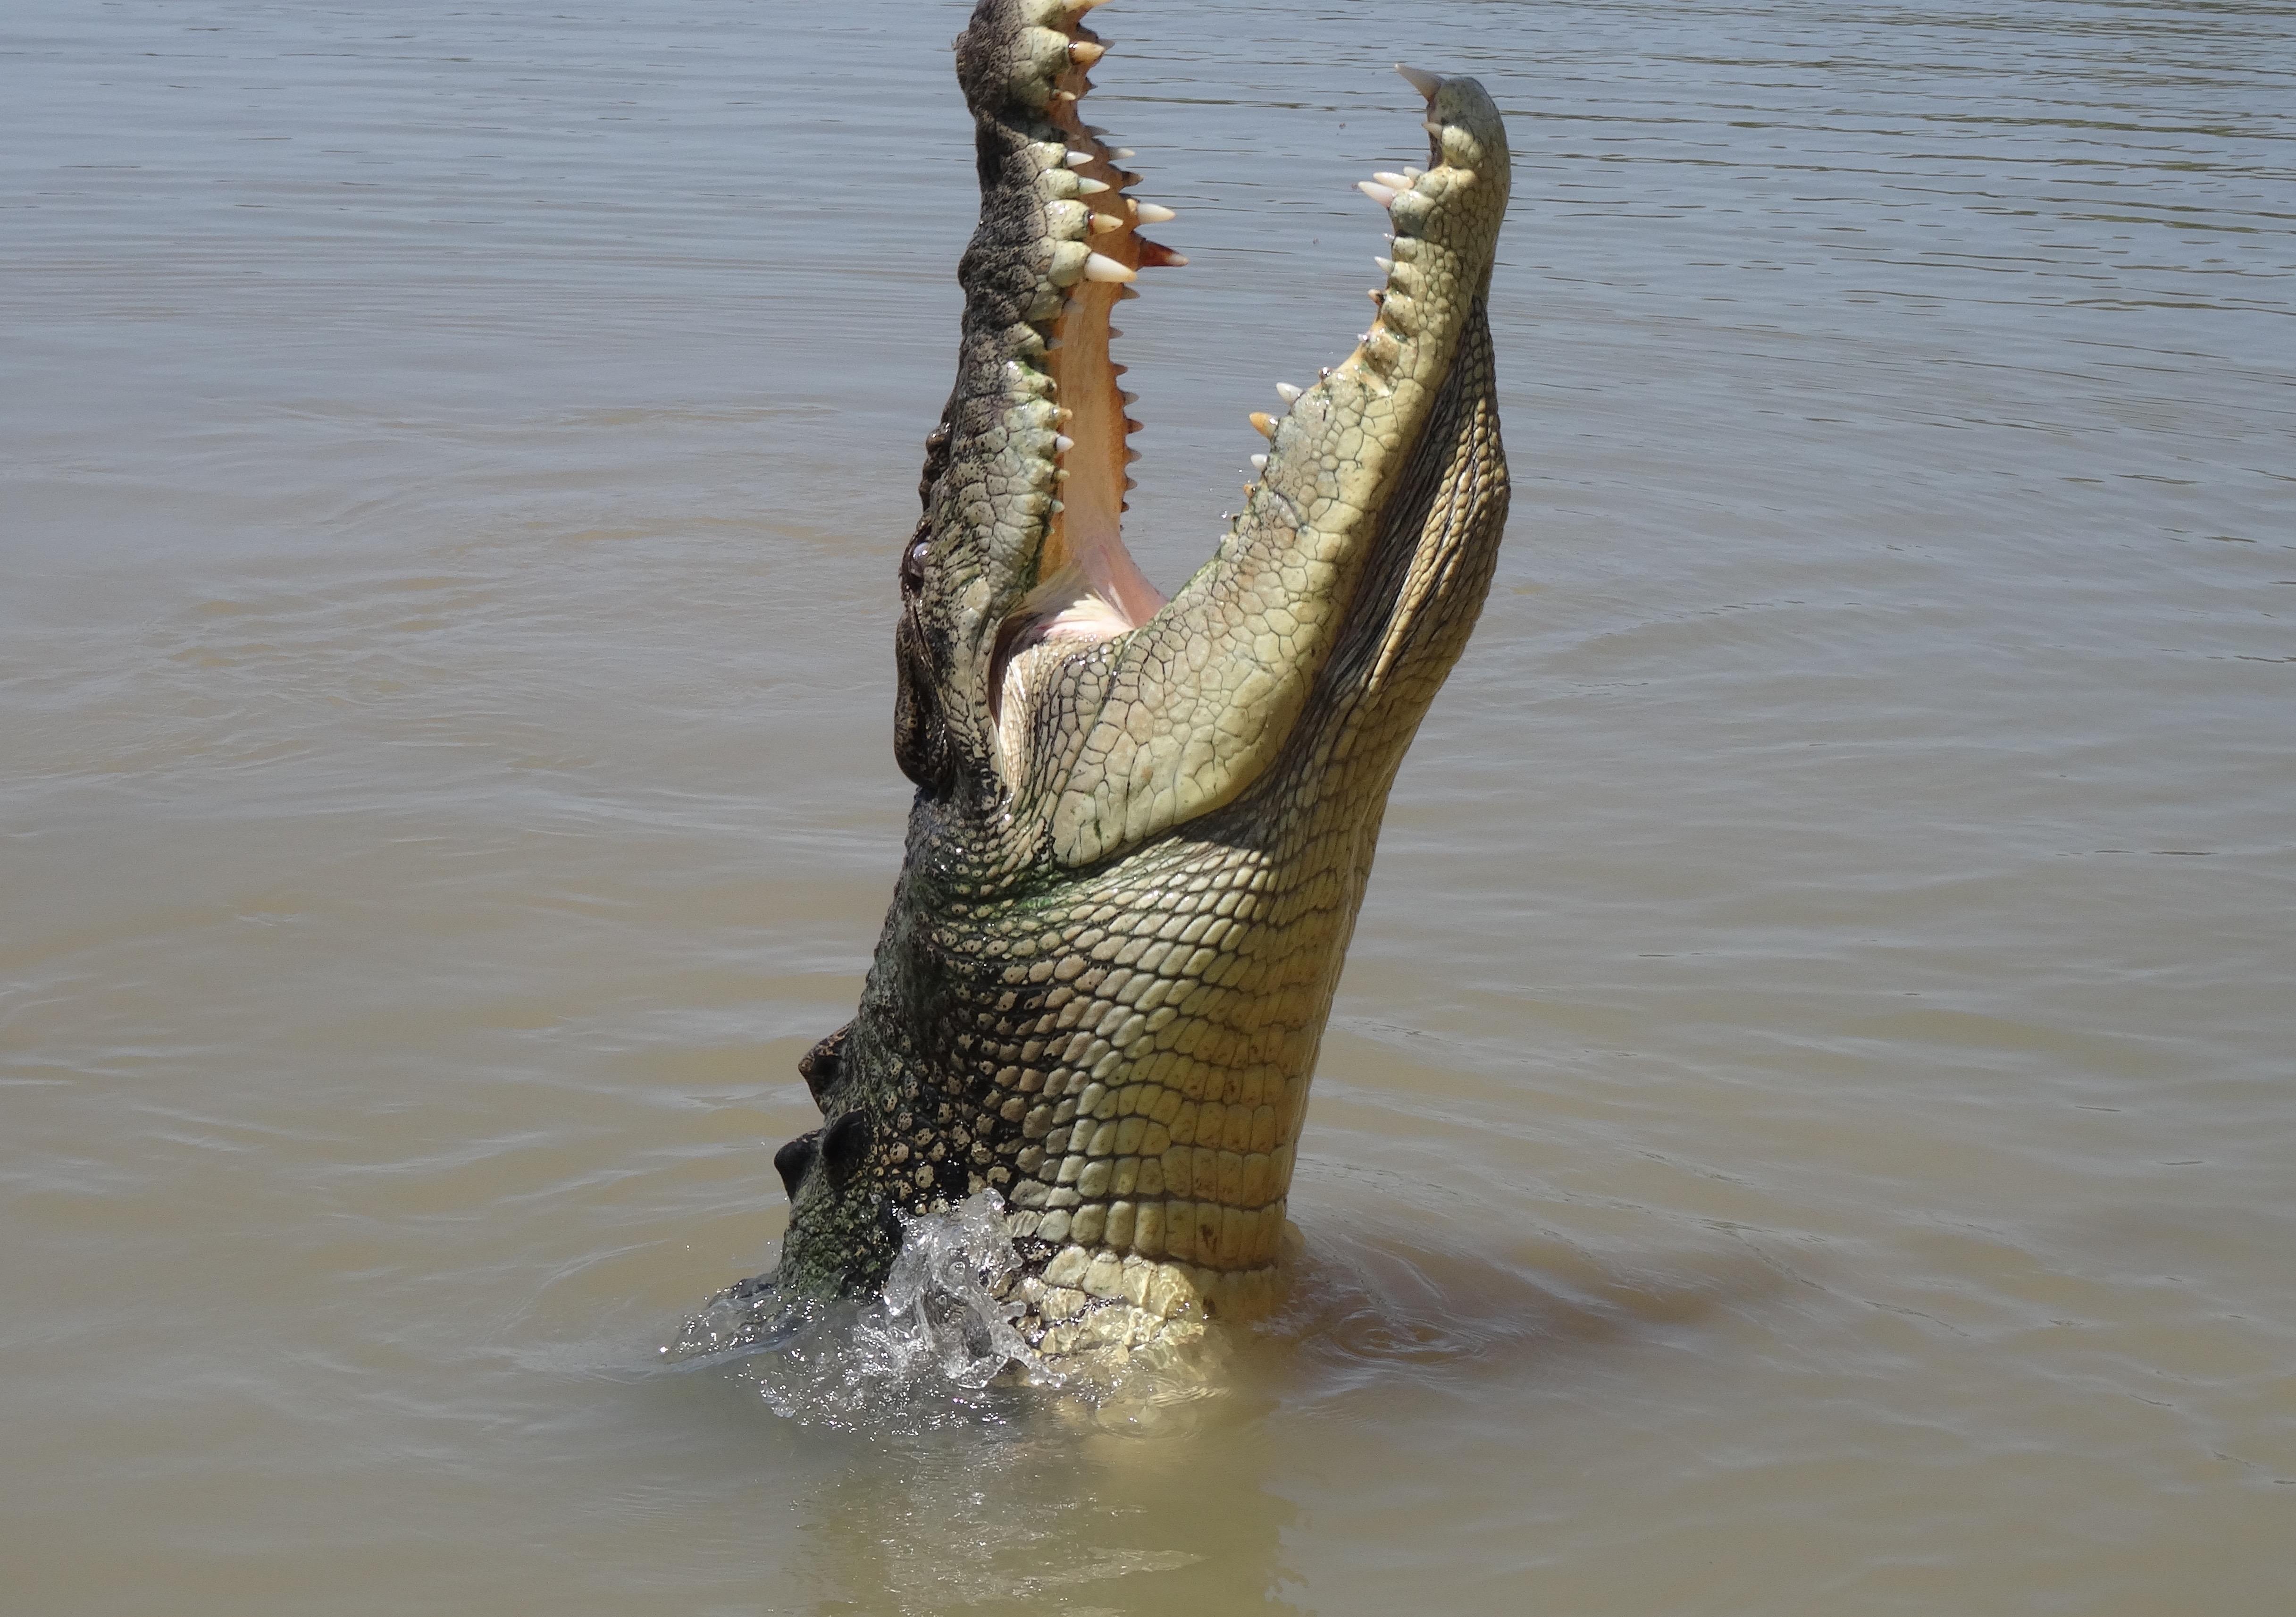 Large Saltwater croc